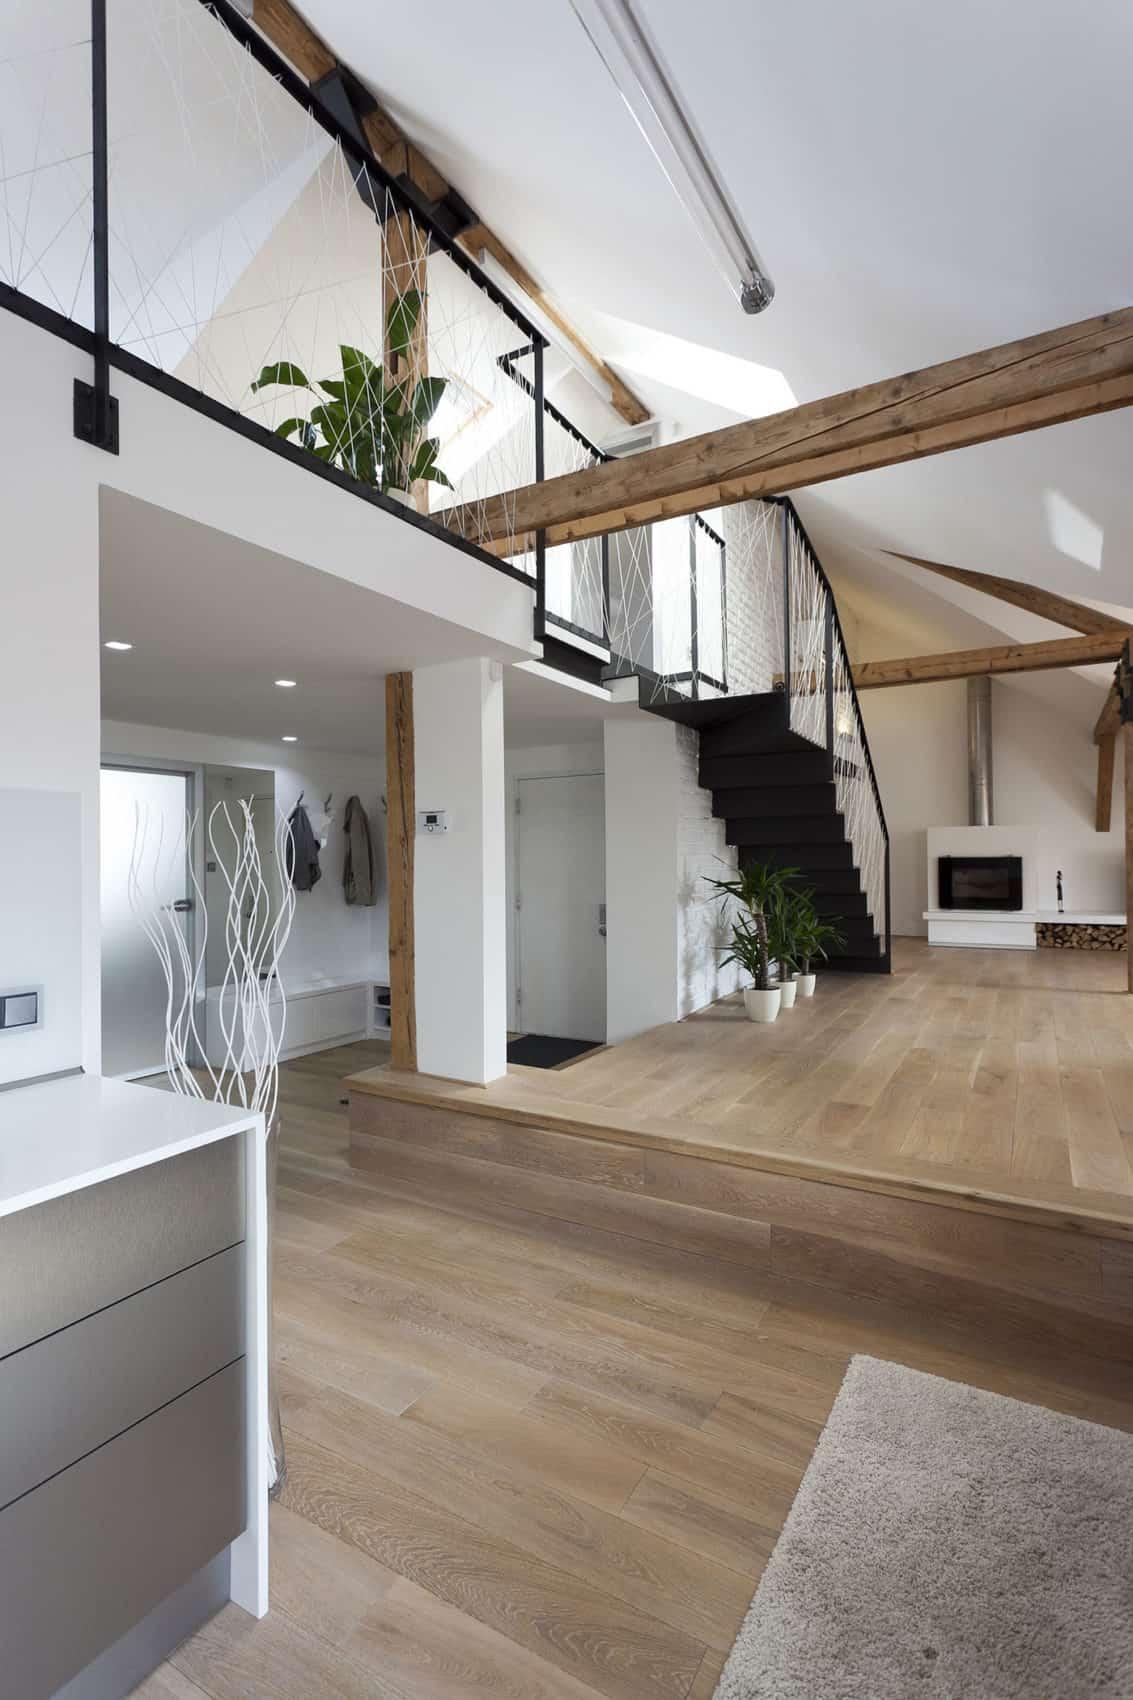 Attic Loft Reconstruction by B² Architecture (7)